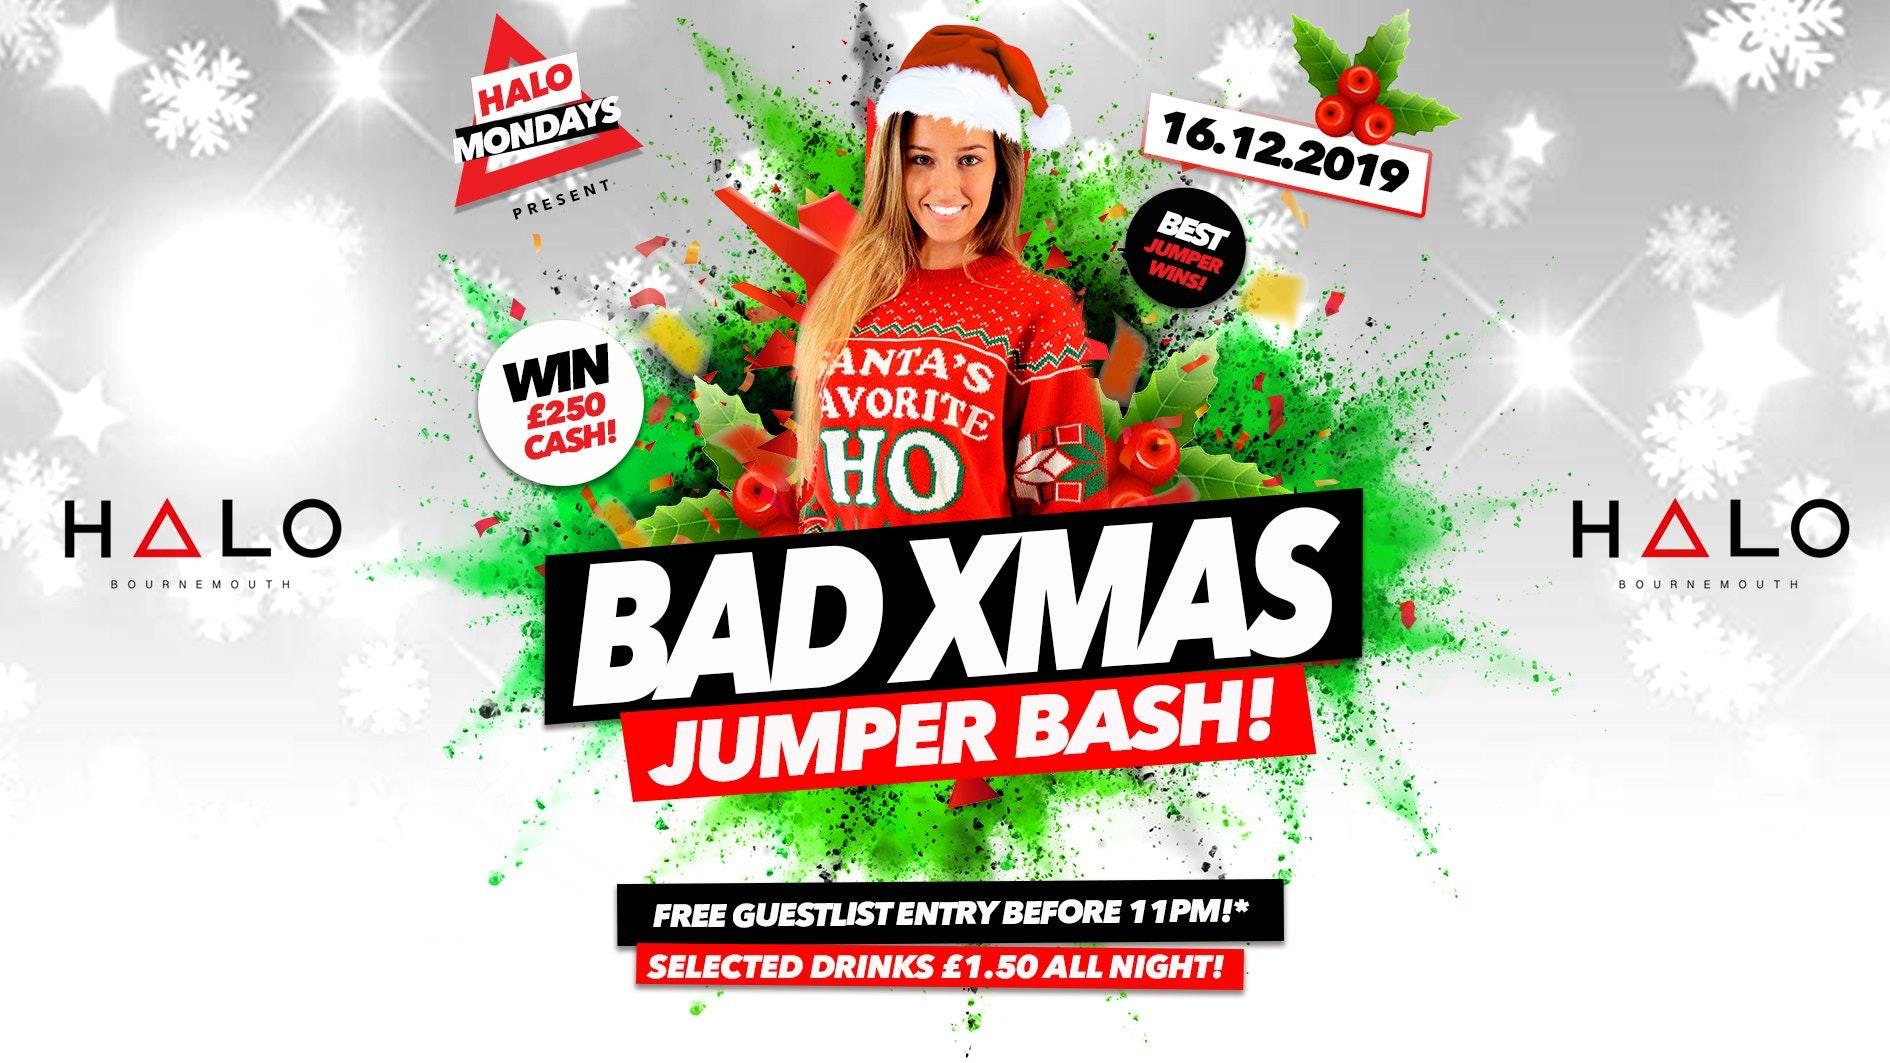 Bad Xmas Jumper Bash – Win £250 Cash!